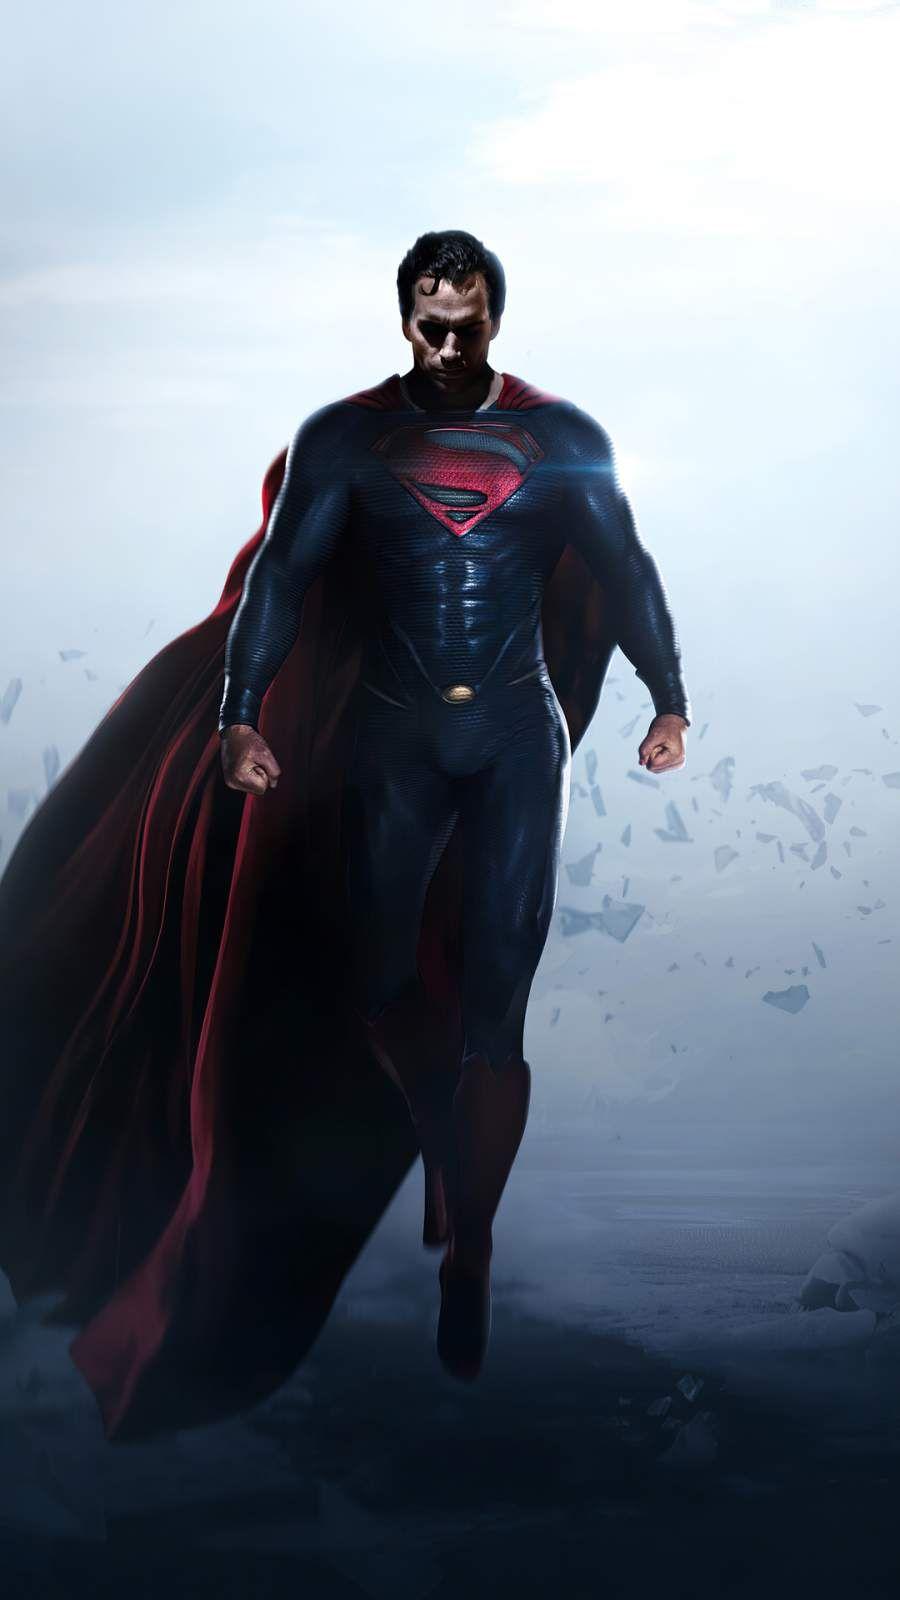 Pin On Superhero